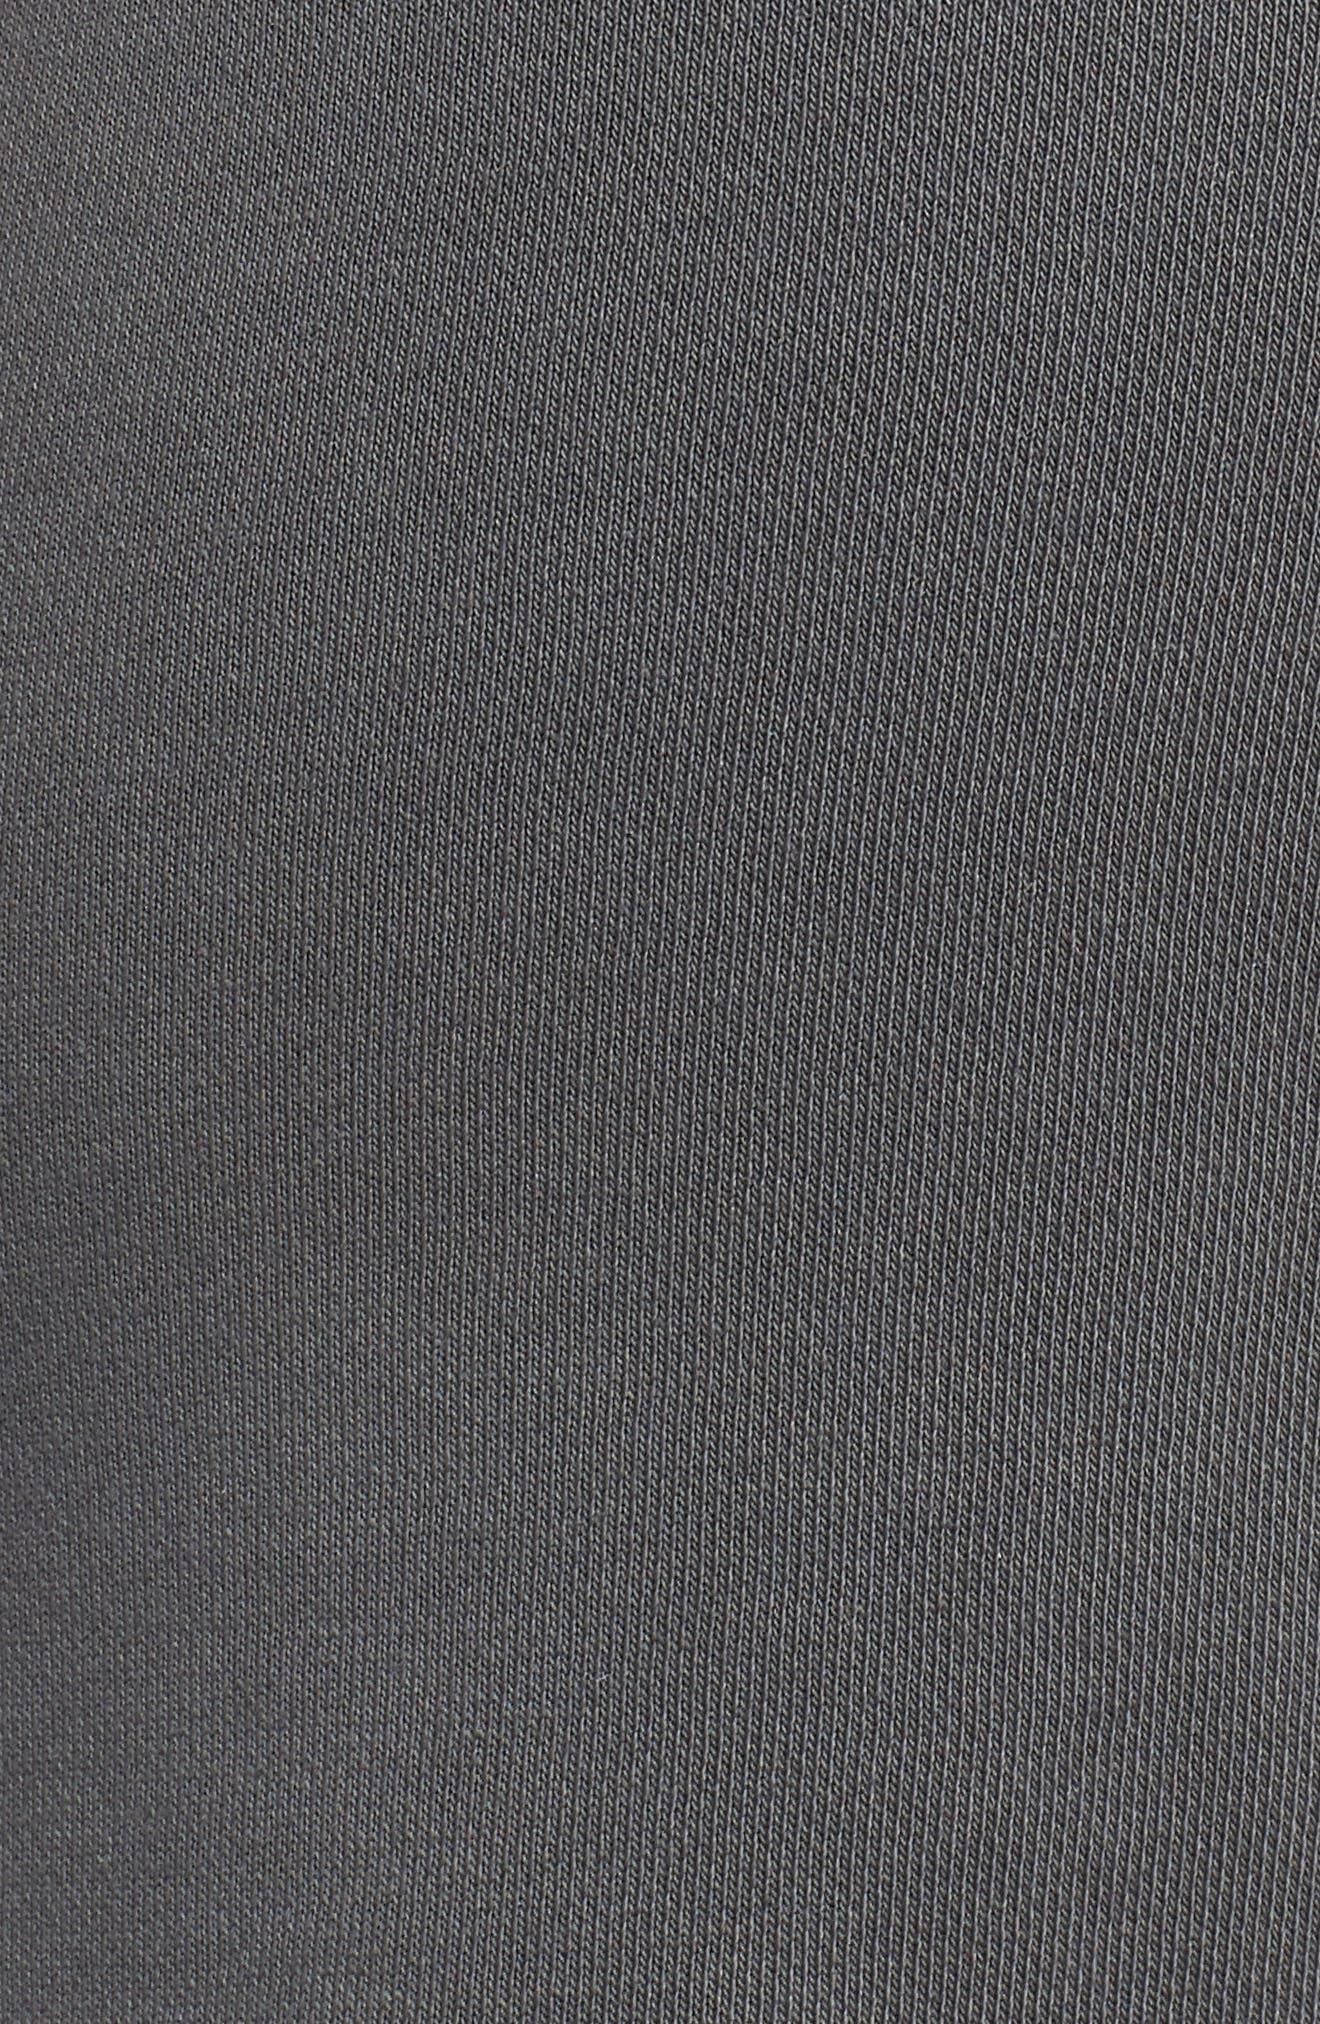 NSW Cotton Blend Shorts,                             Alternate thumbnail 5, color,                             010